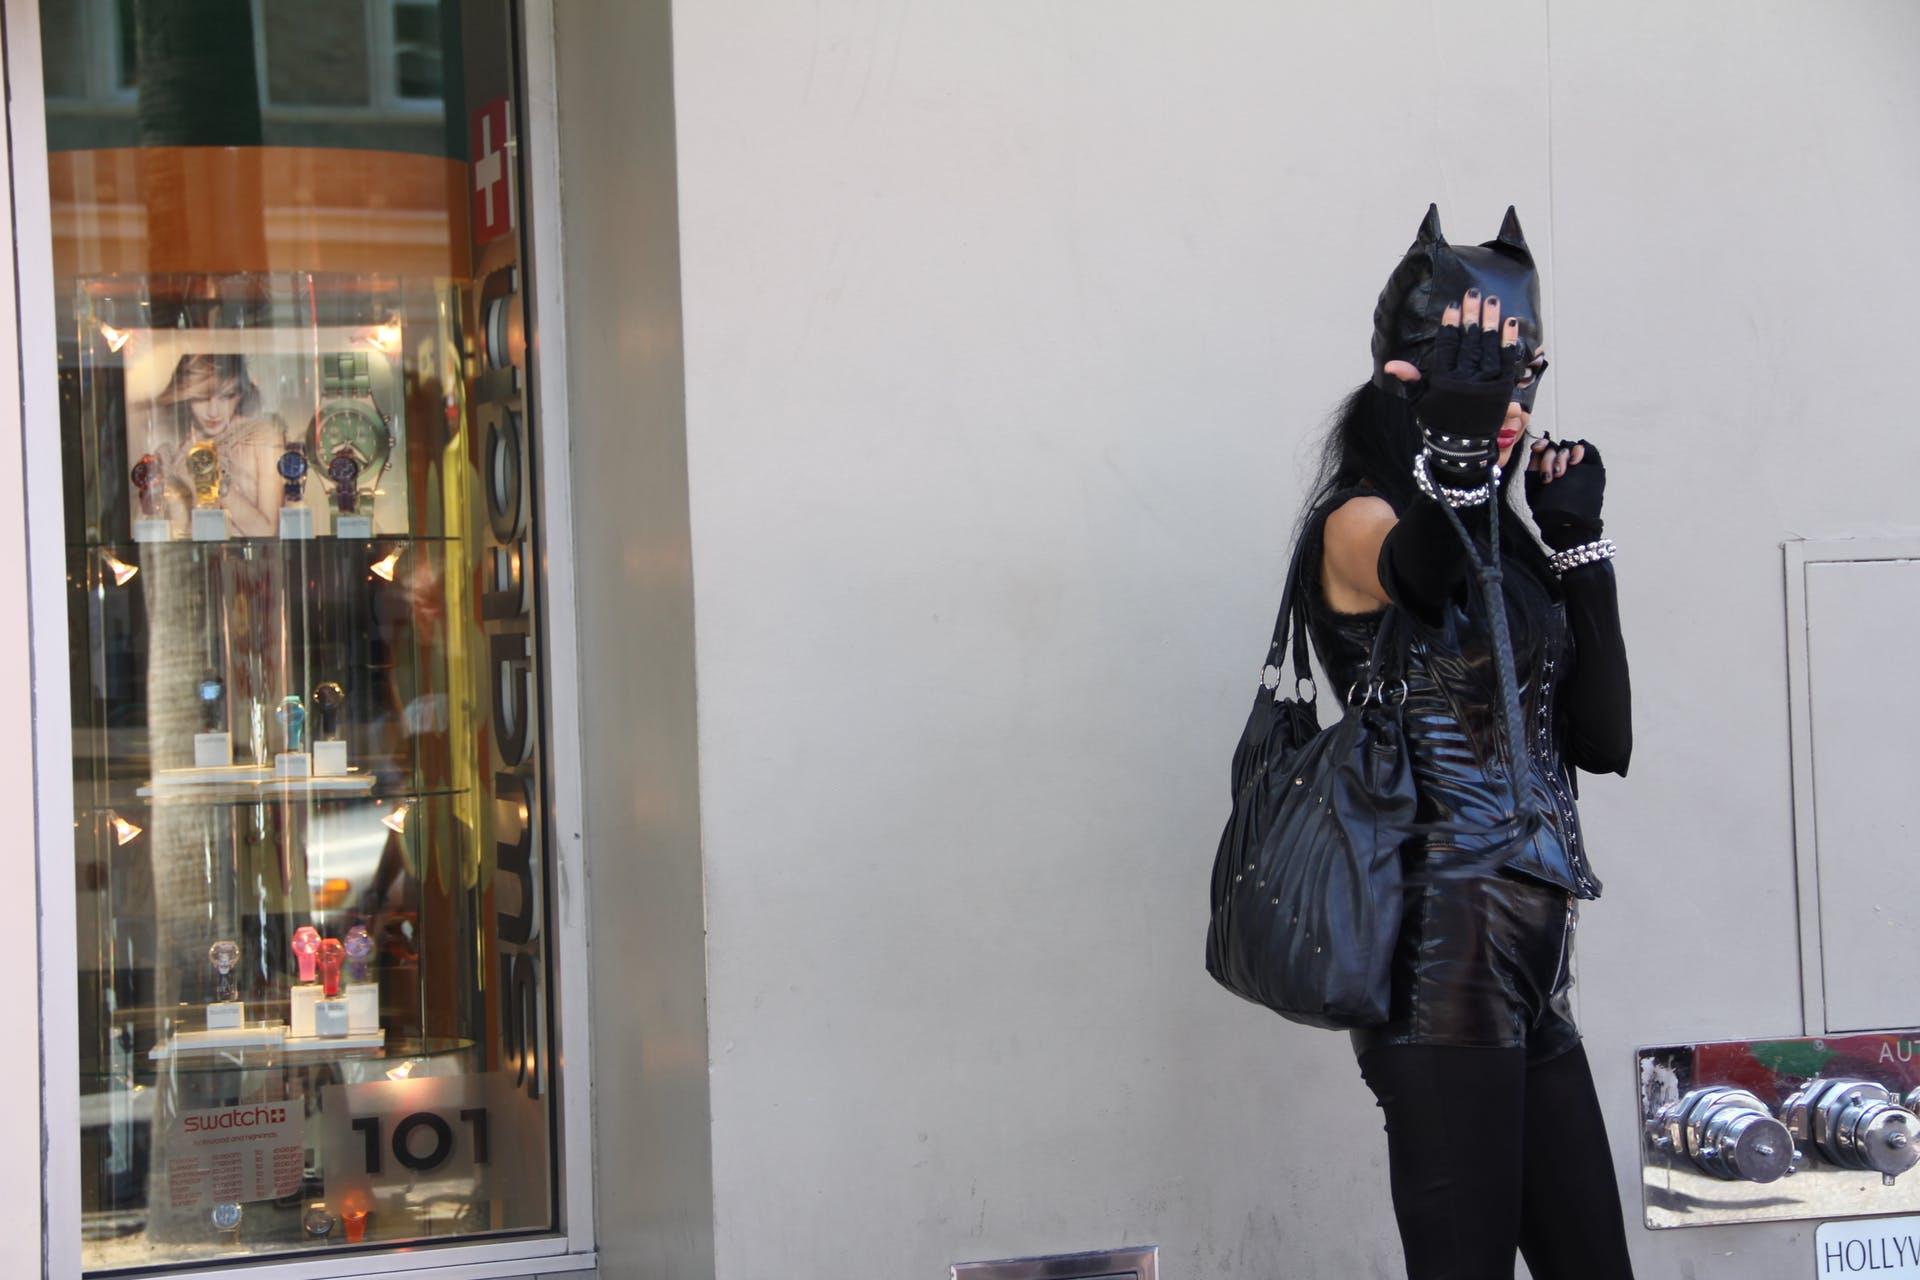 costume fashion street stock travel cat person black shopping tourism